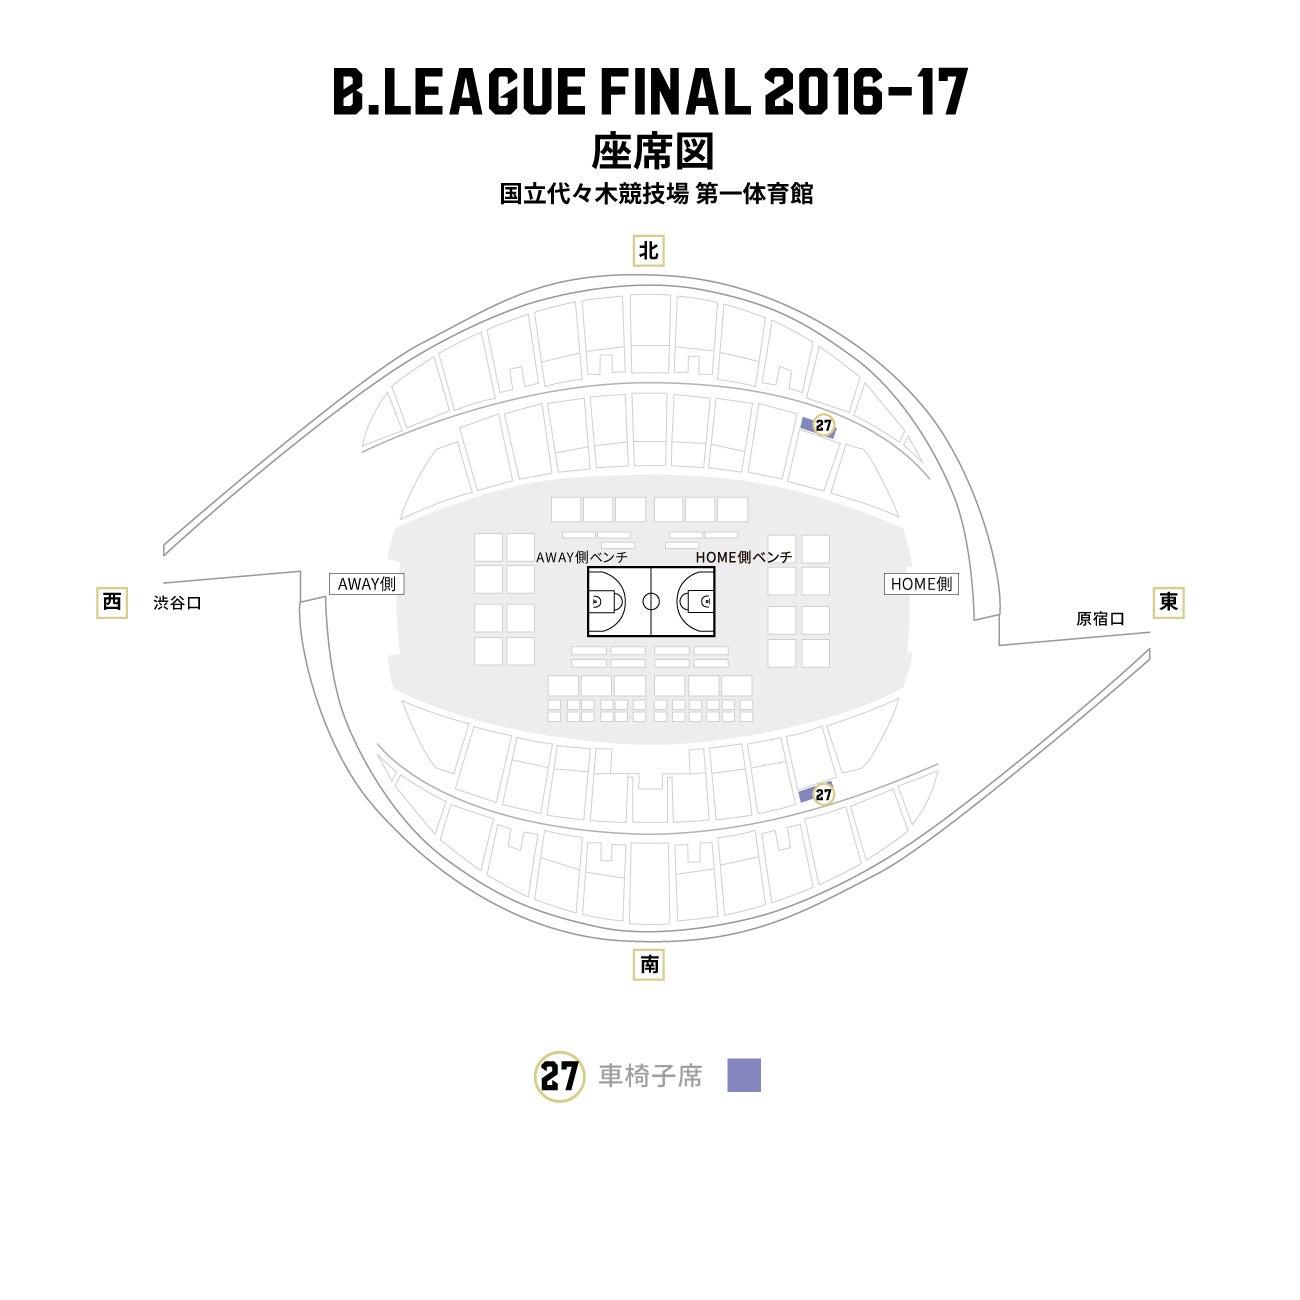 seatview_final_seat_27.jpg